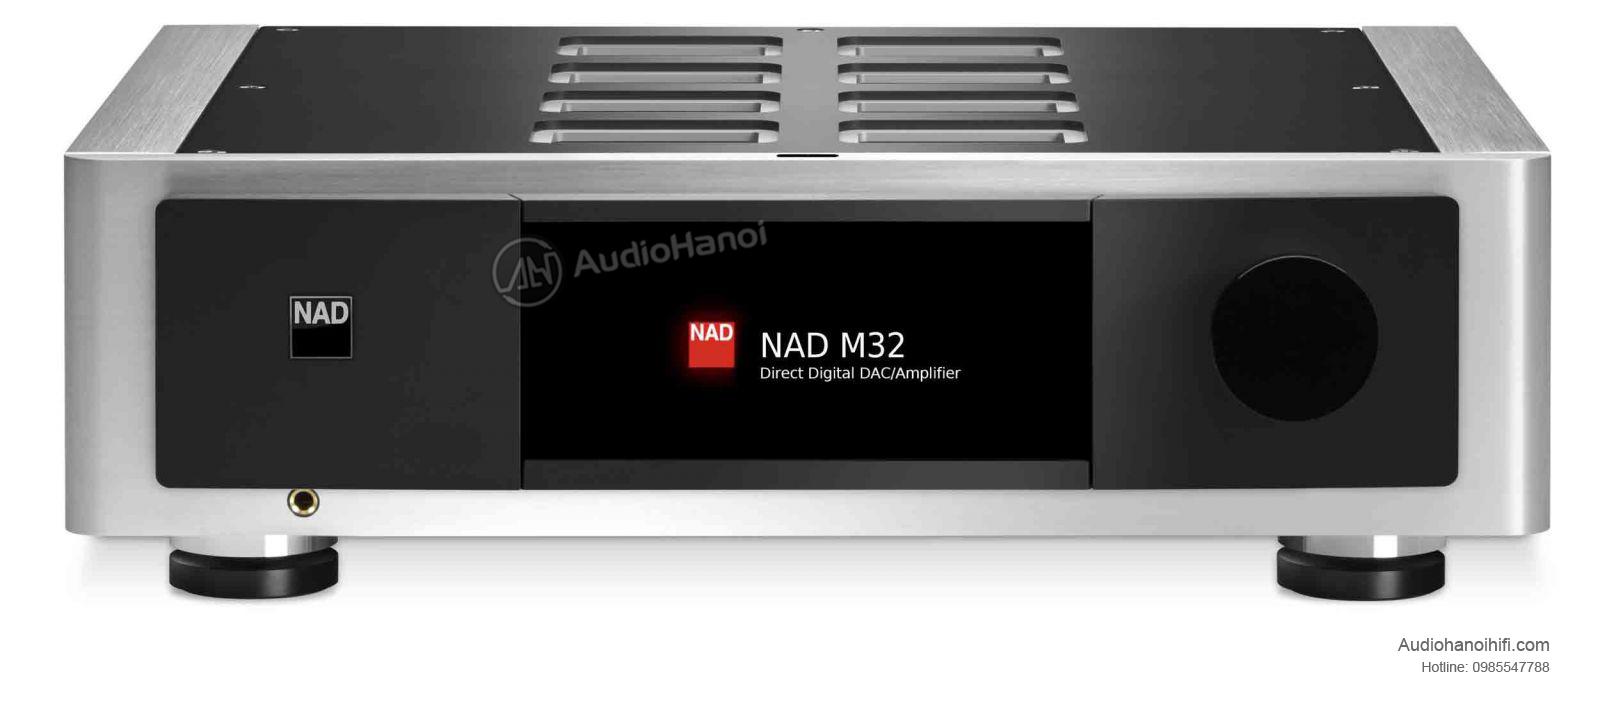 ampli NAD M32 hay